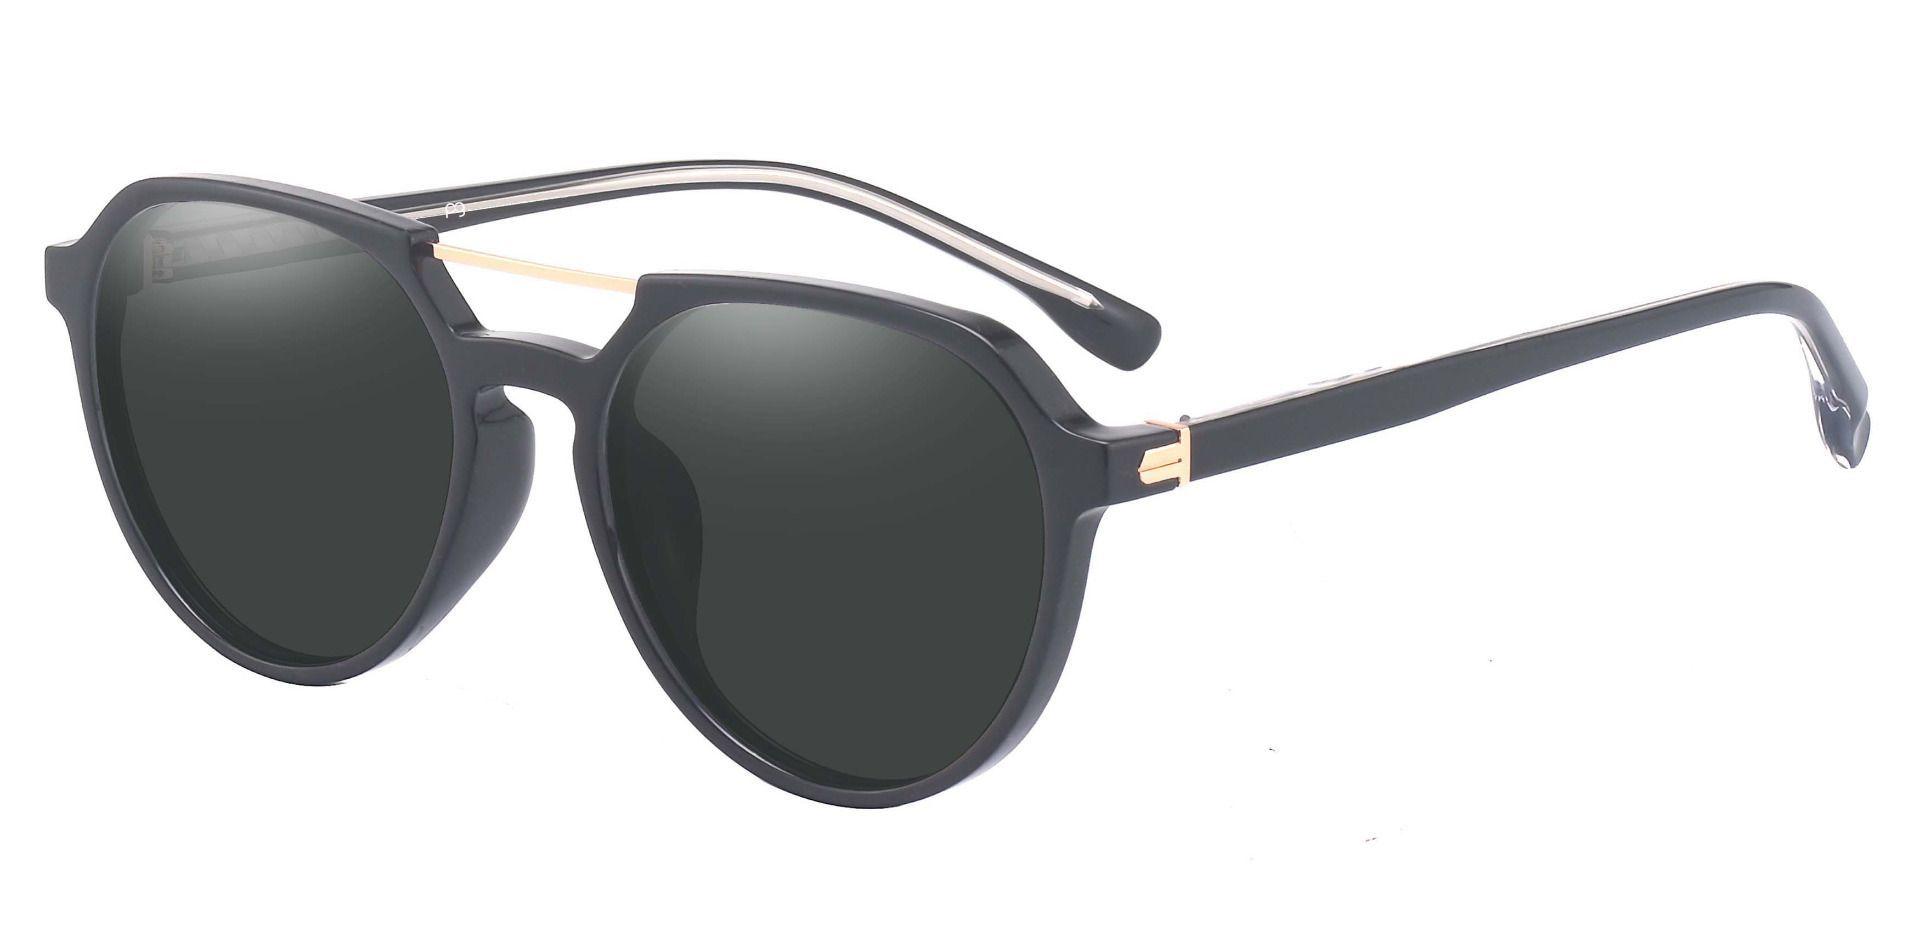 Bentley Aviator Progressive Sunglasses - Black Frame With Gray Lenses